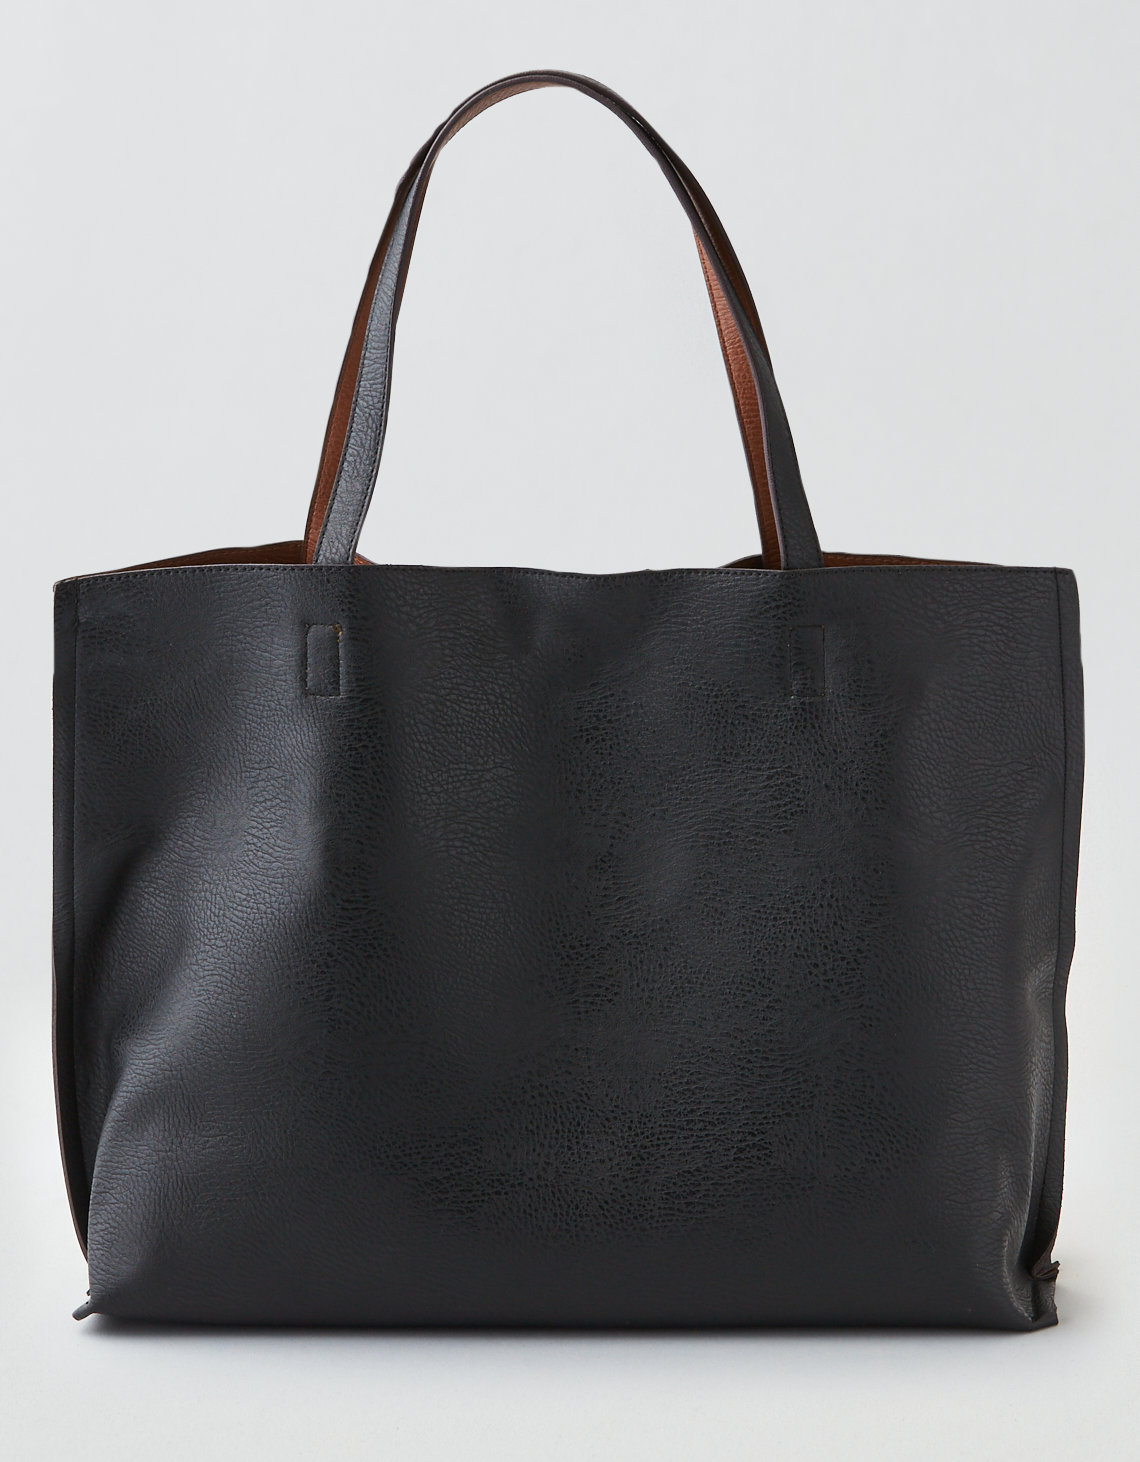 774f2fc4ed4fc Street Level Reversible Tote Bag